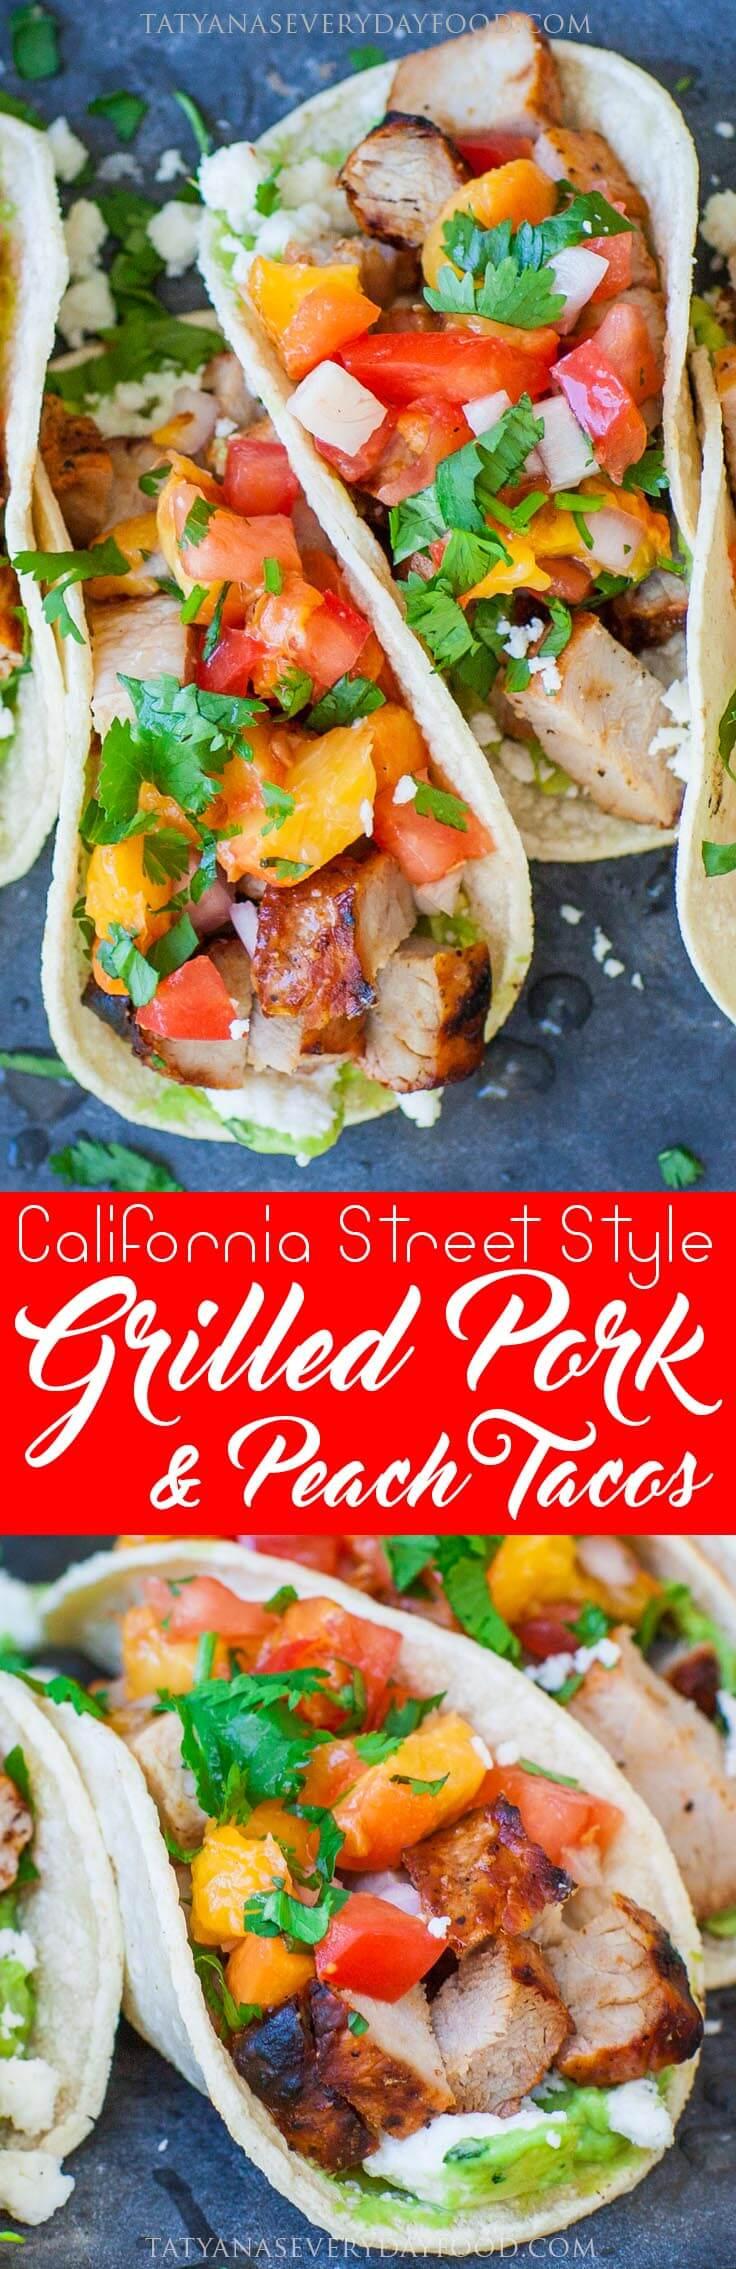 Grilled Peach & Pork Tacos video recipe